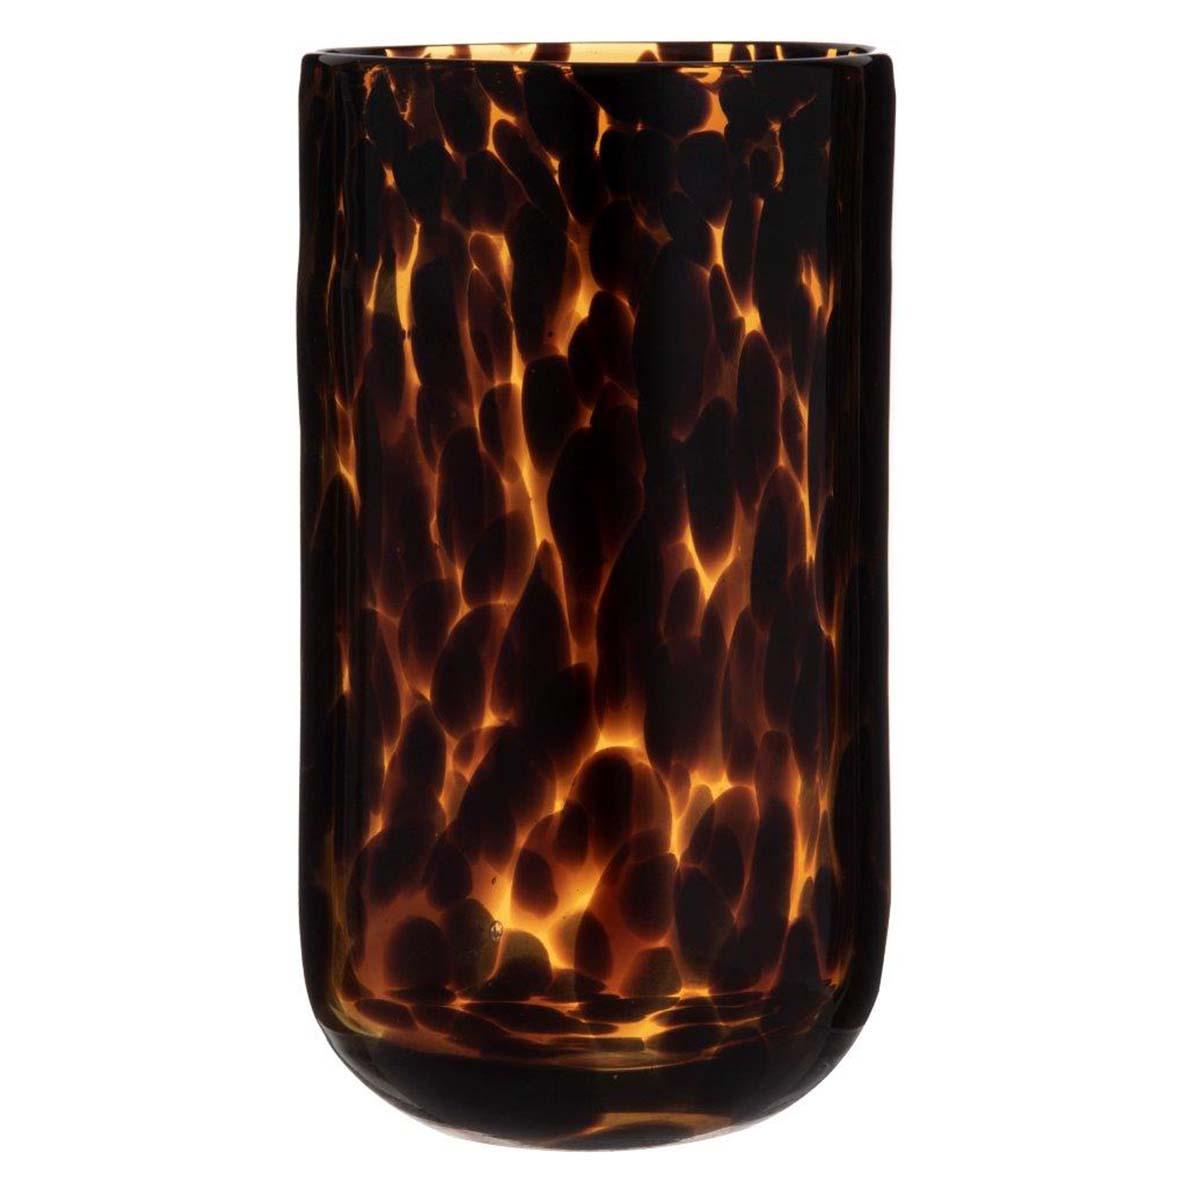 EMBER VASE 14X23CM in amber/black